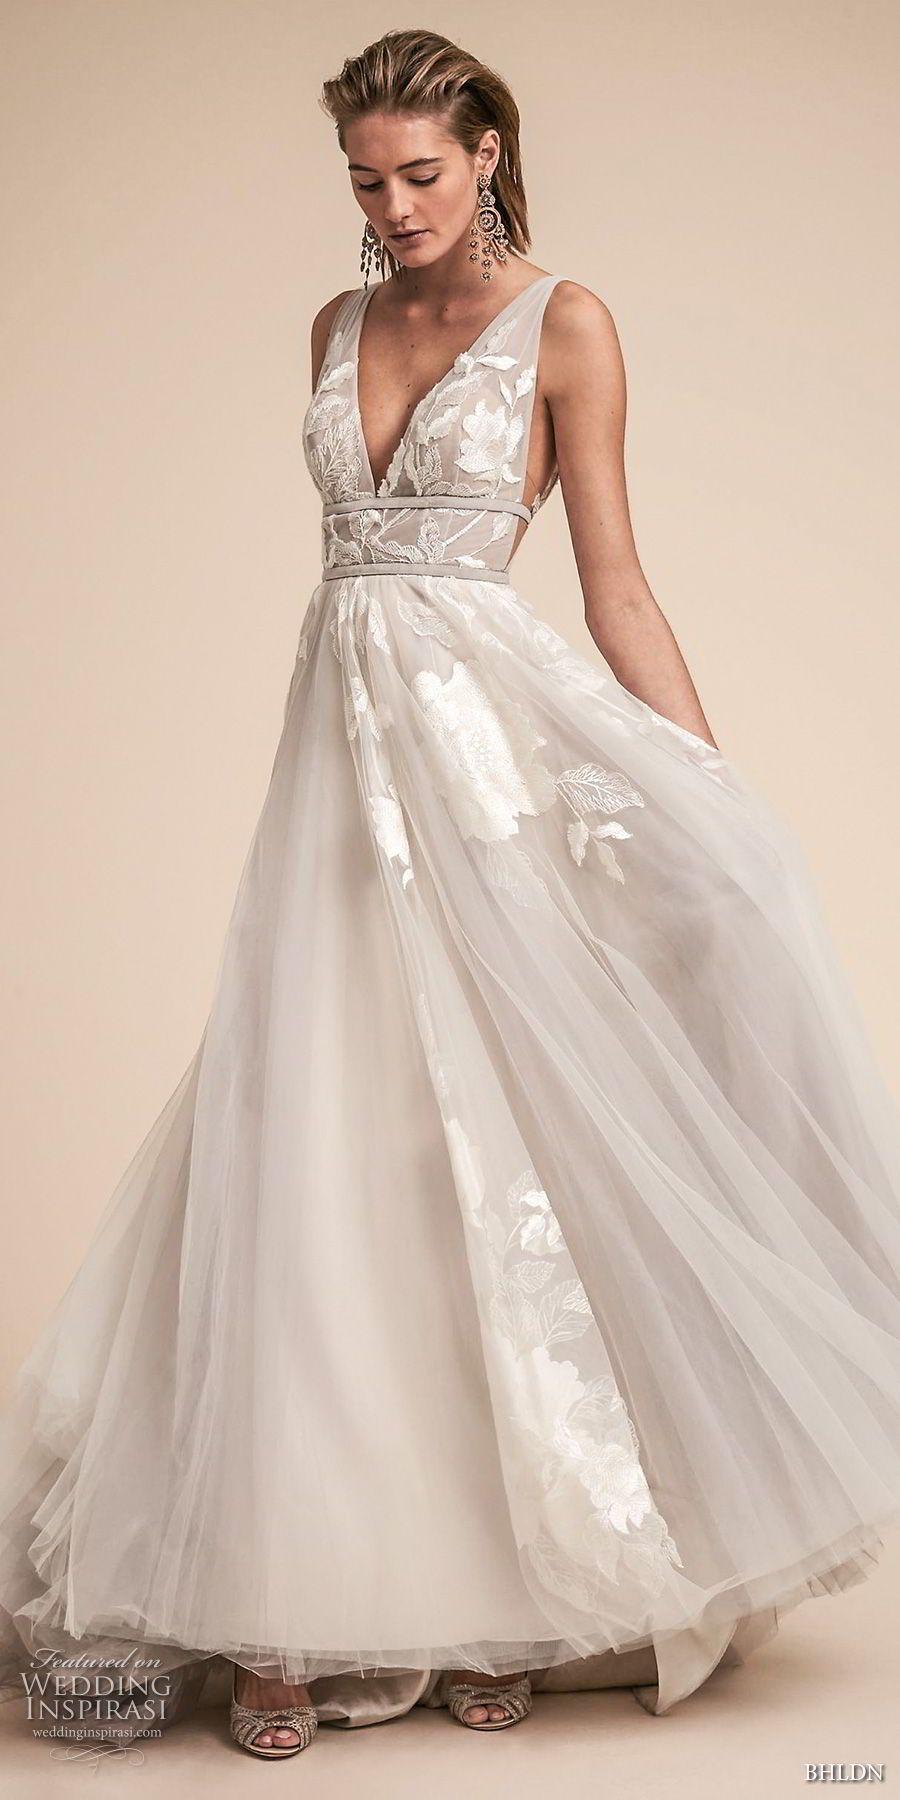 Bhldn spring wedding dresses bodice romantic and wedding dress